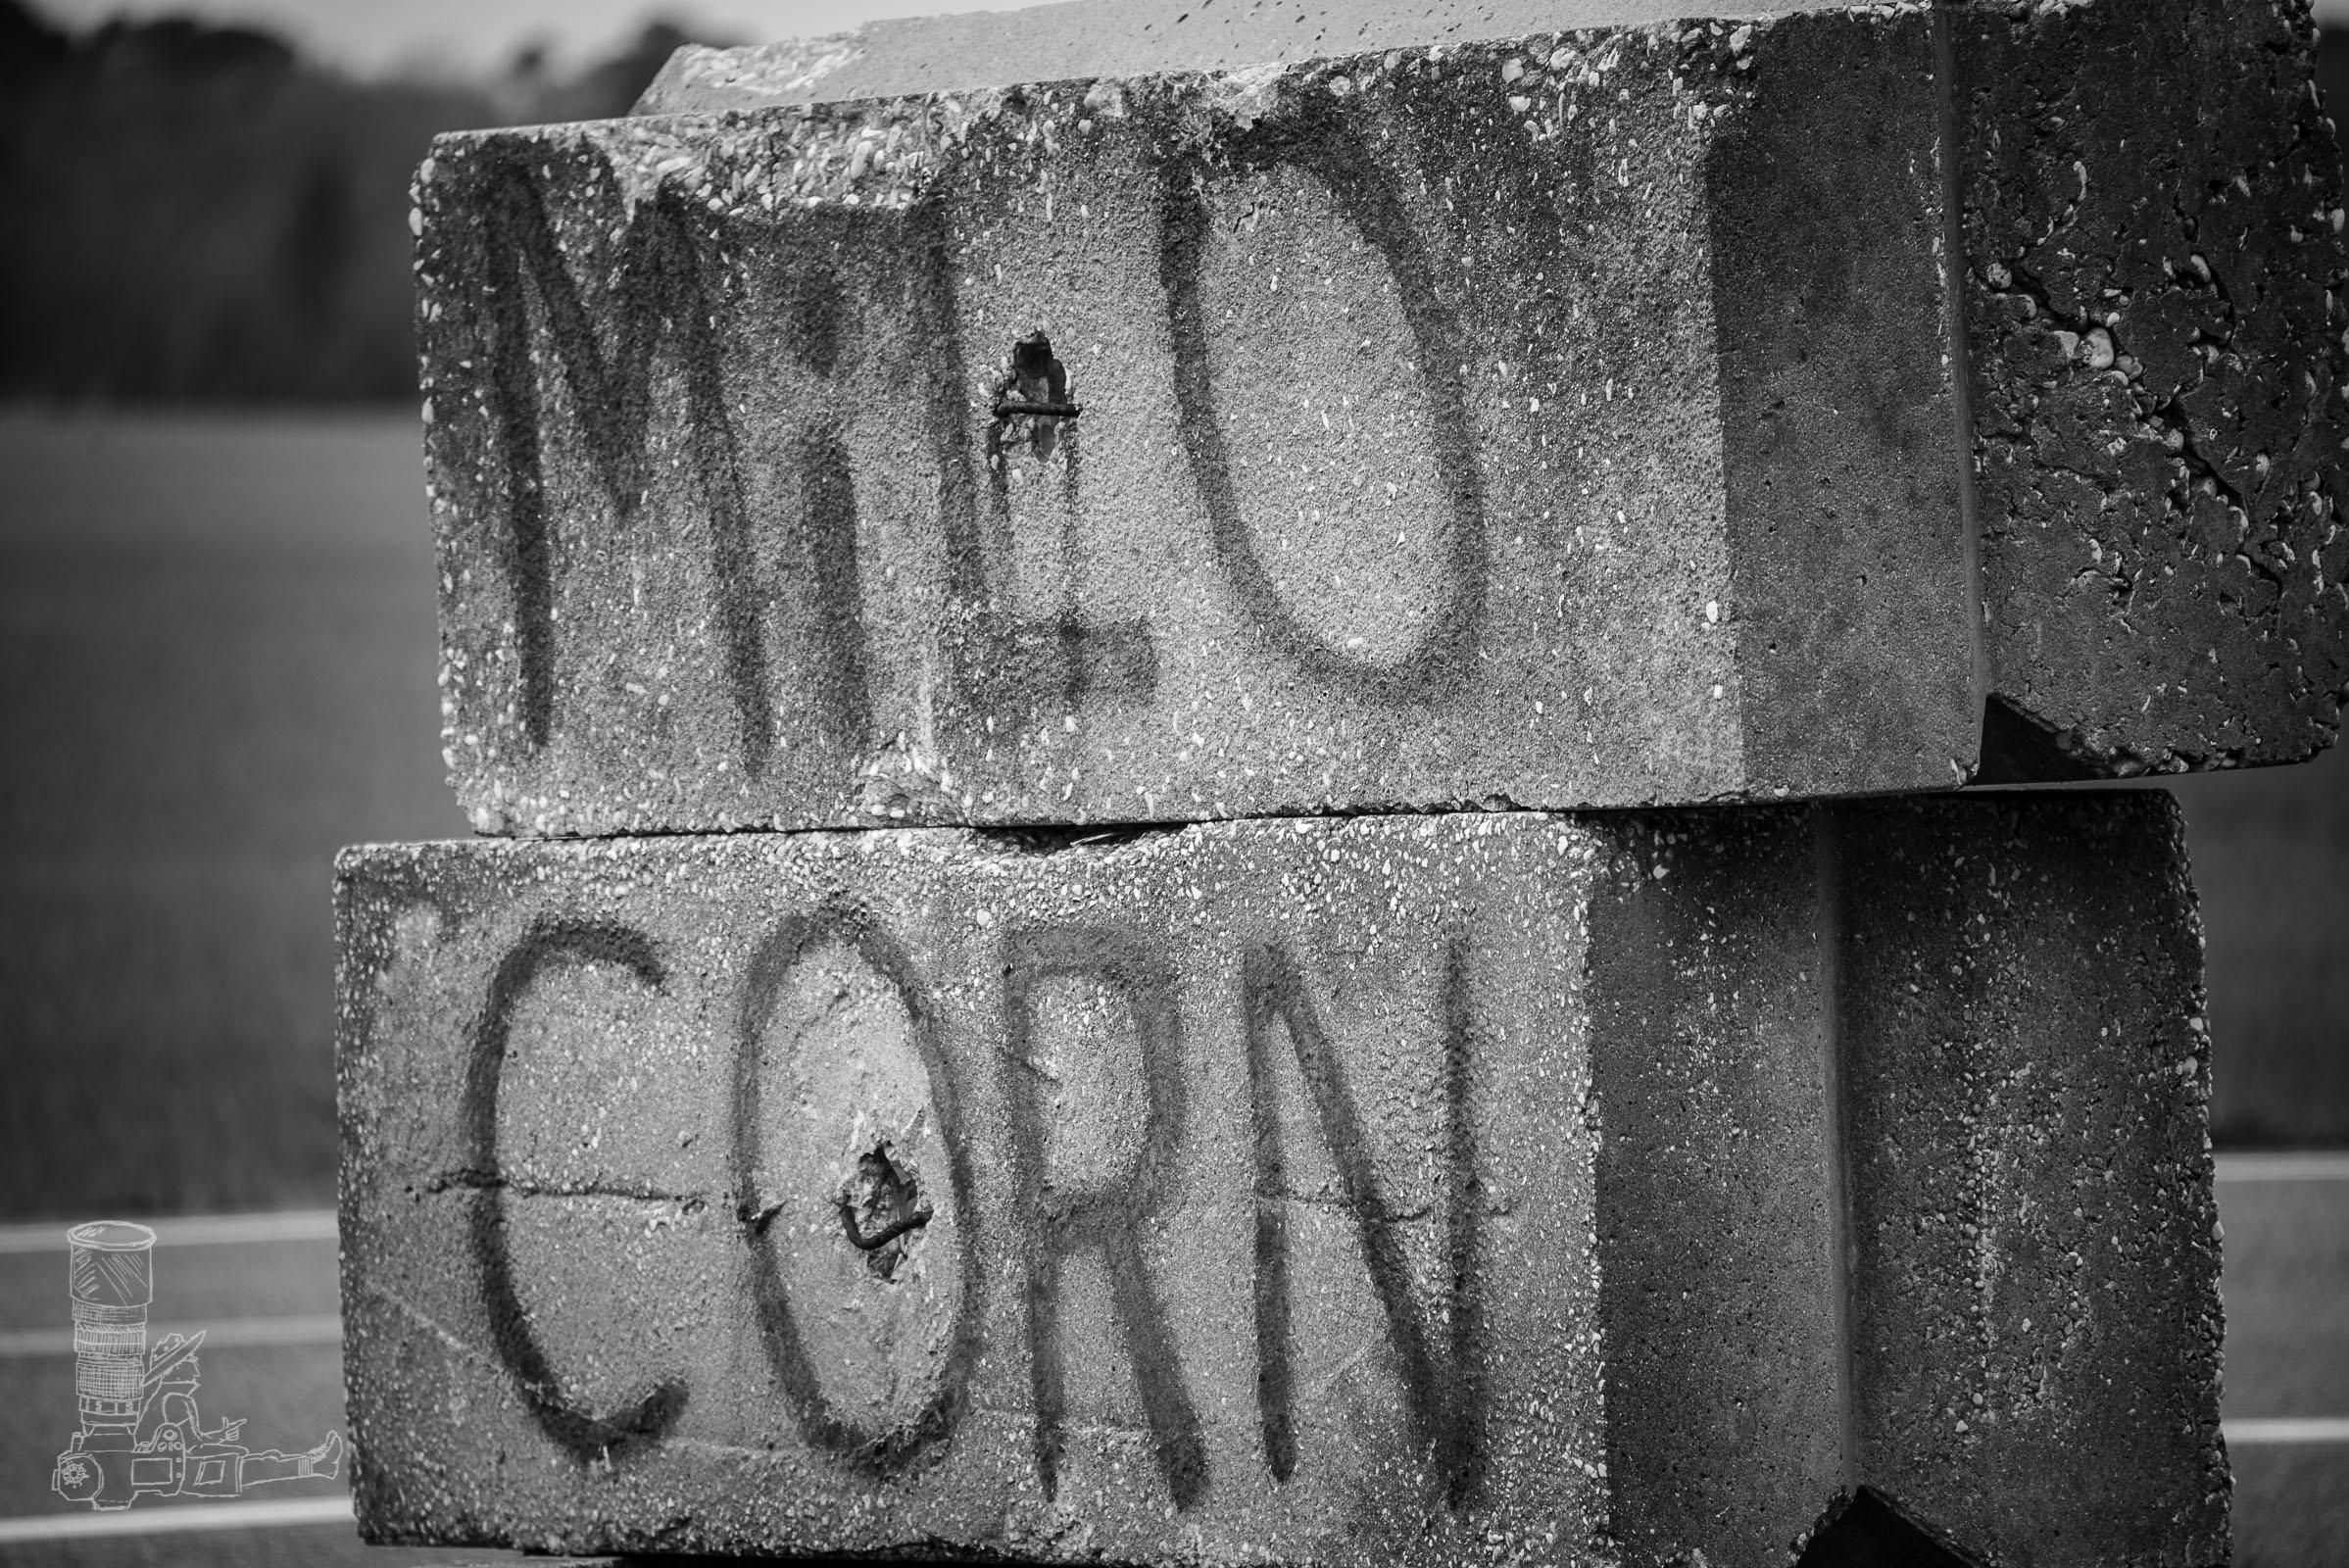 Milo Corn